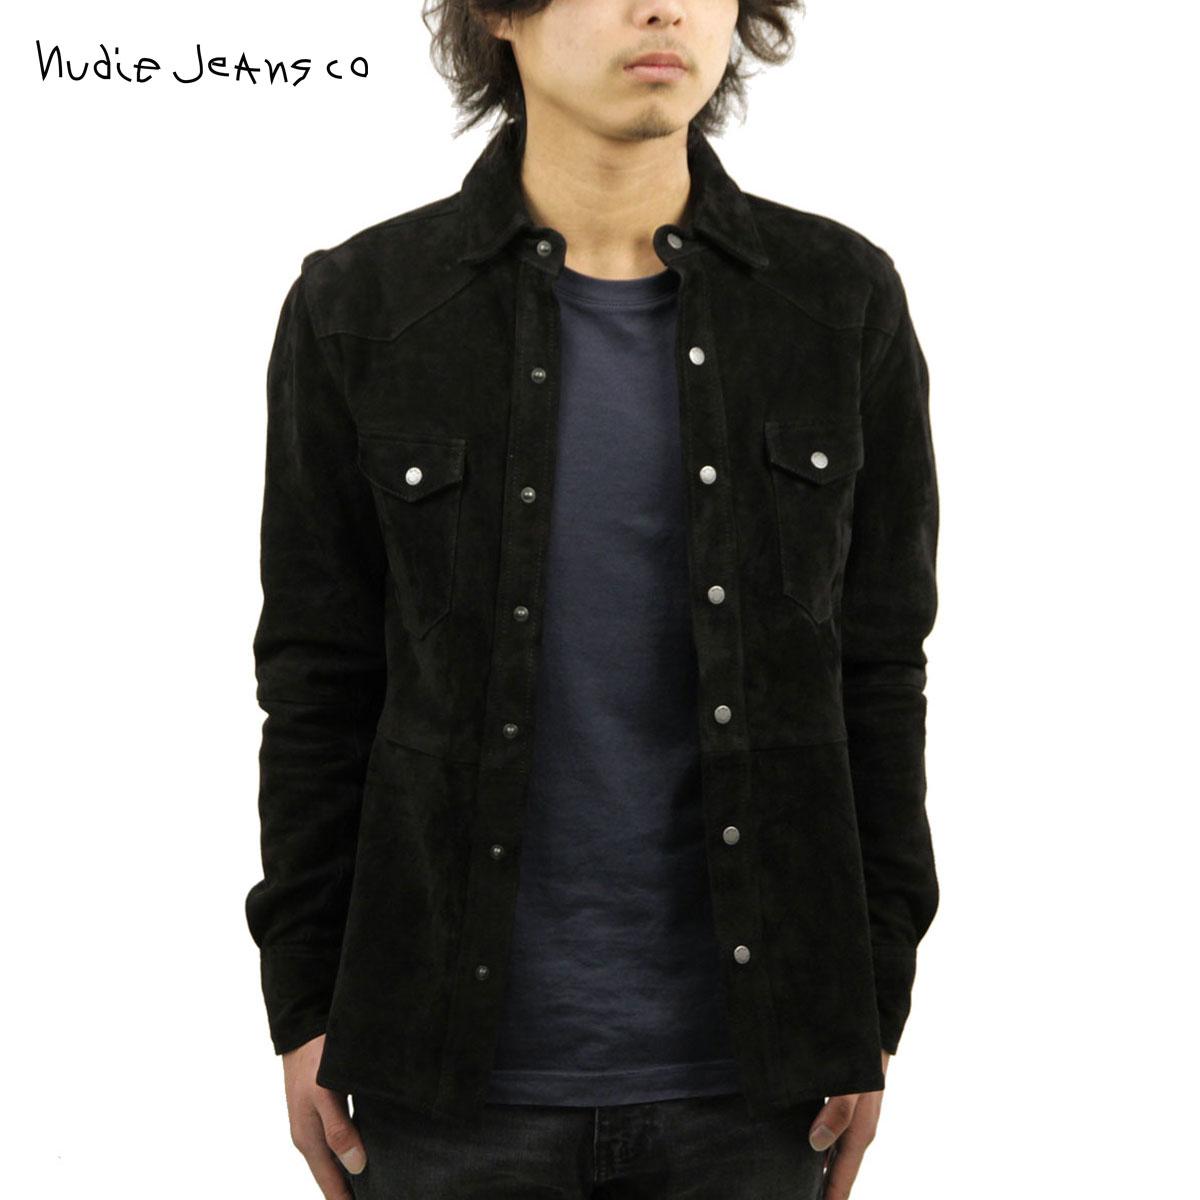 25%OFFセール 【販売期間 11/3 20:00~11/12 9:59】 ヌーディージーンズ Nudie Jeans 正規販売店 メンズ 長袖シャツ Jonis Suede Shirt Black B01 140300 3027 D15S25